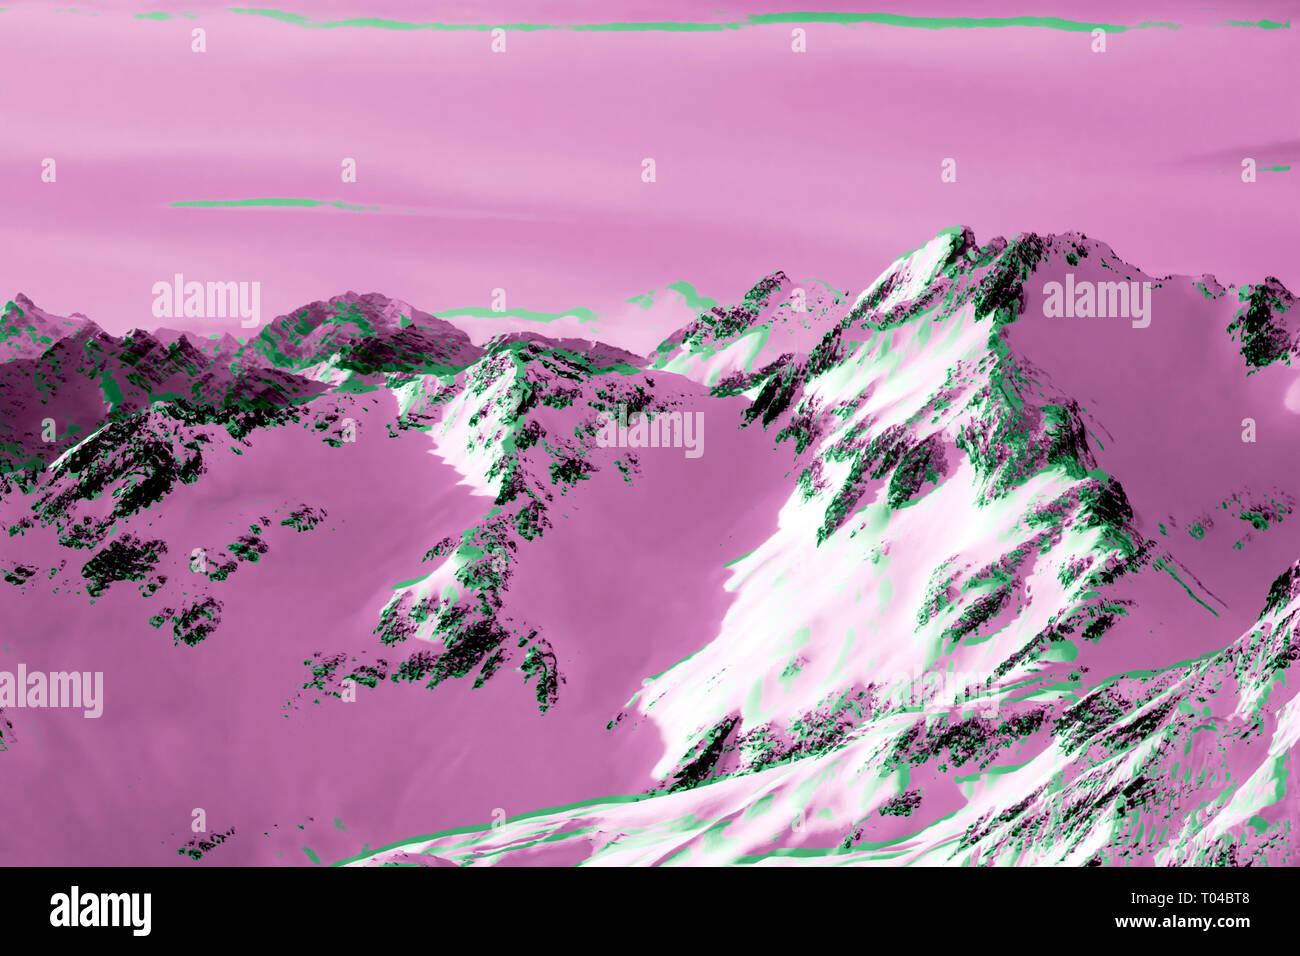 camera matrix mistake beautiful Alps mountain lanscape rocks under snow - Stock Image